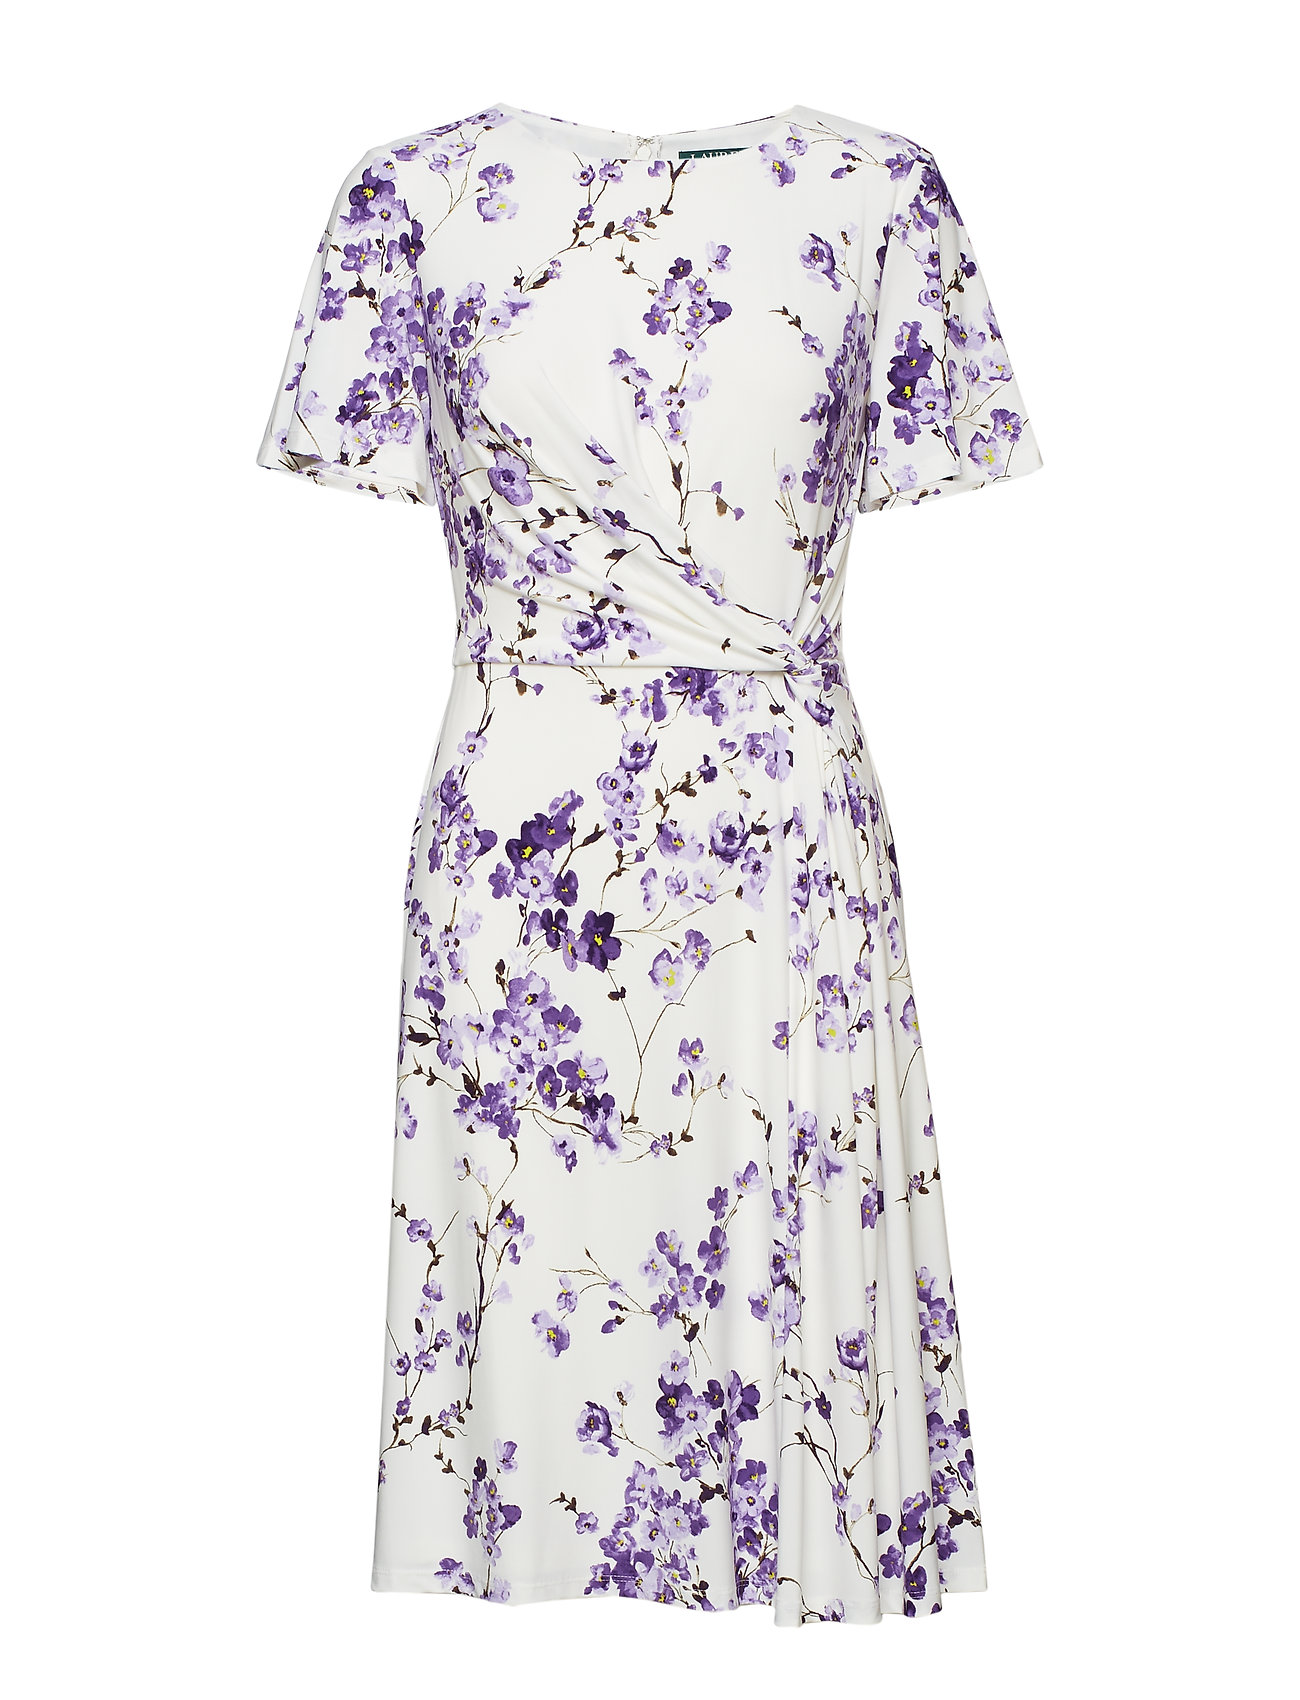 Lauren Ralph Lauren Knot Floral-Print Jersey Dress - COL CREAM/PURPLE/